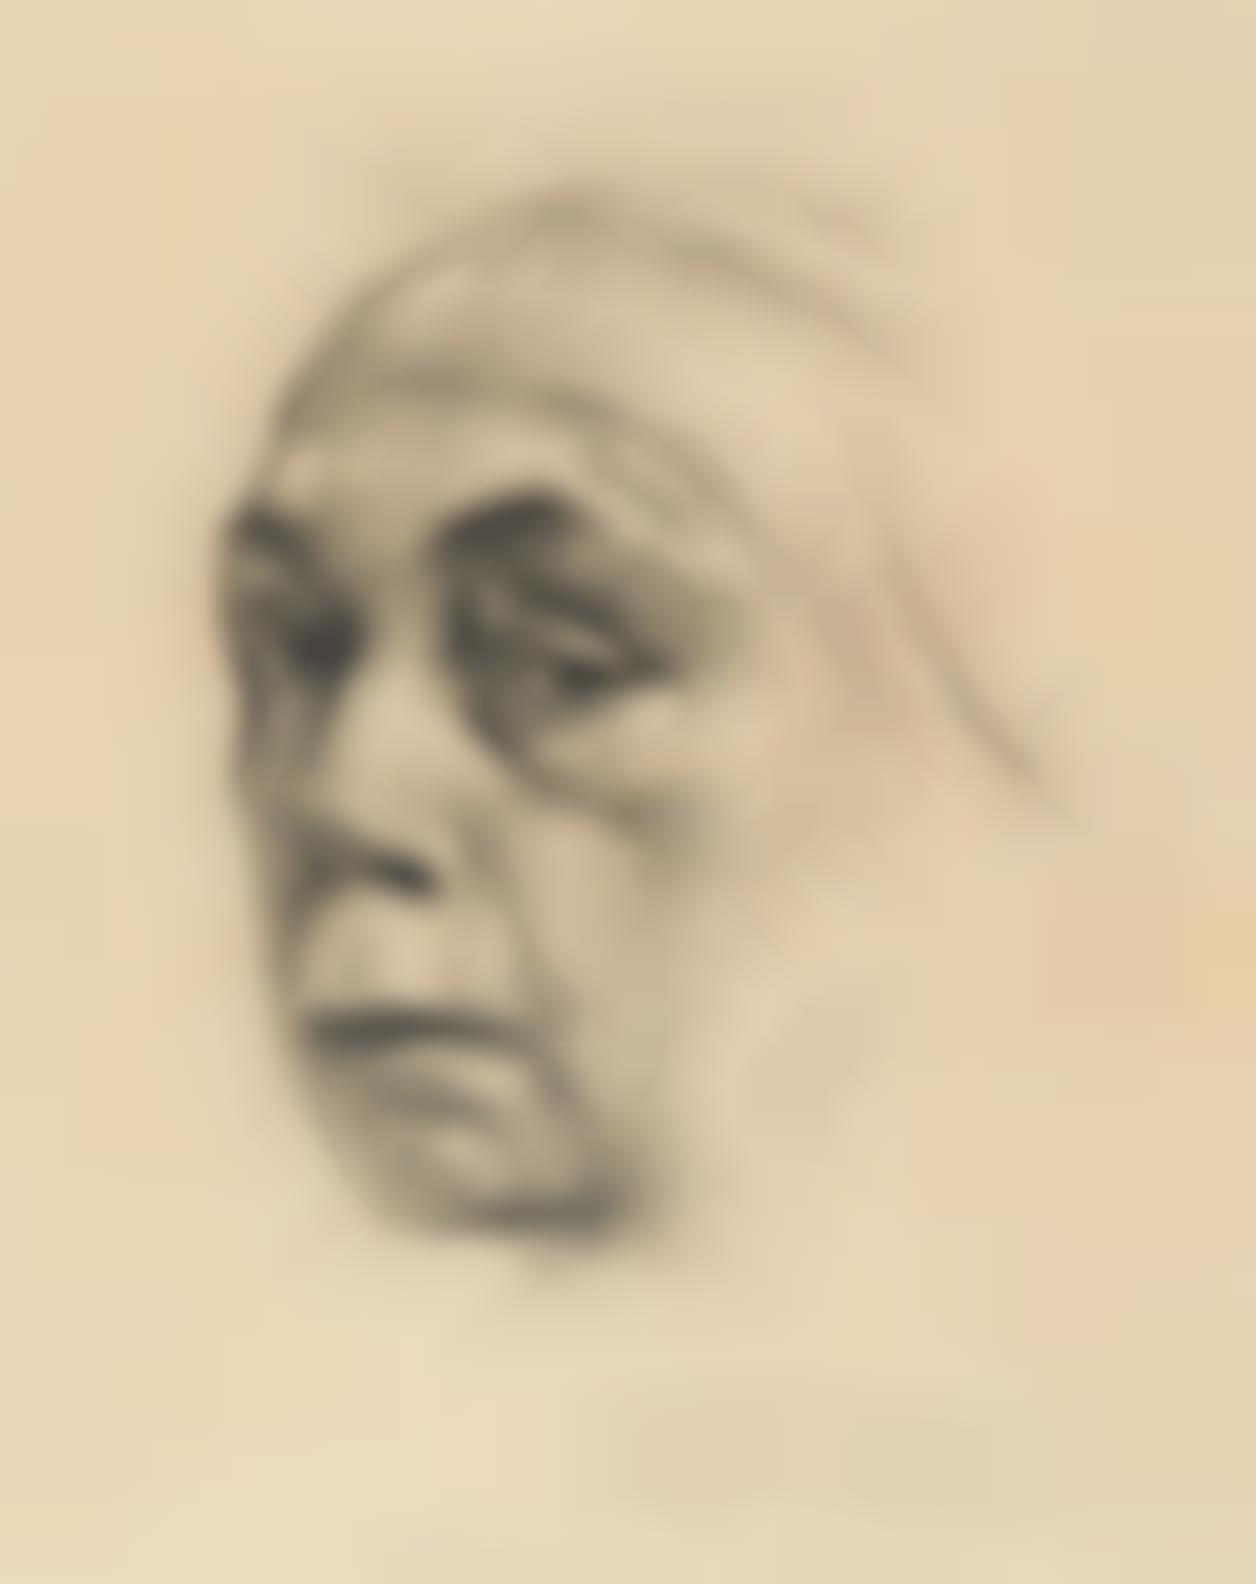 Kathe Kollwitz-Selbstbildnis (Self-Portrait) (K. 198; Kn. 209)-1924